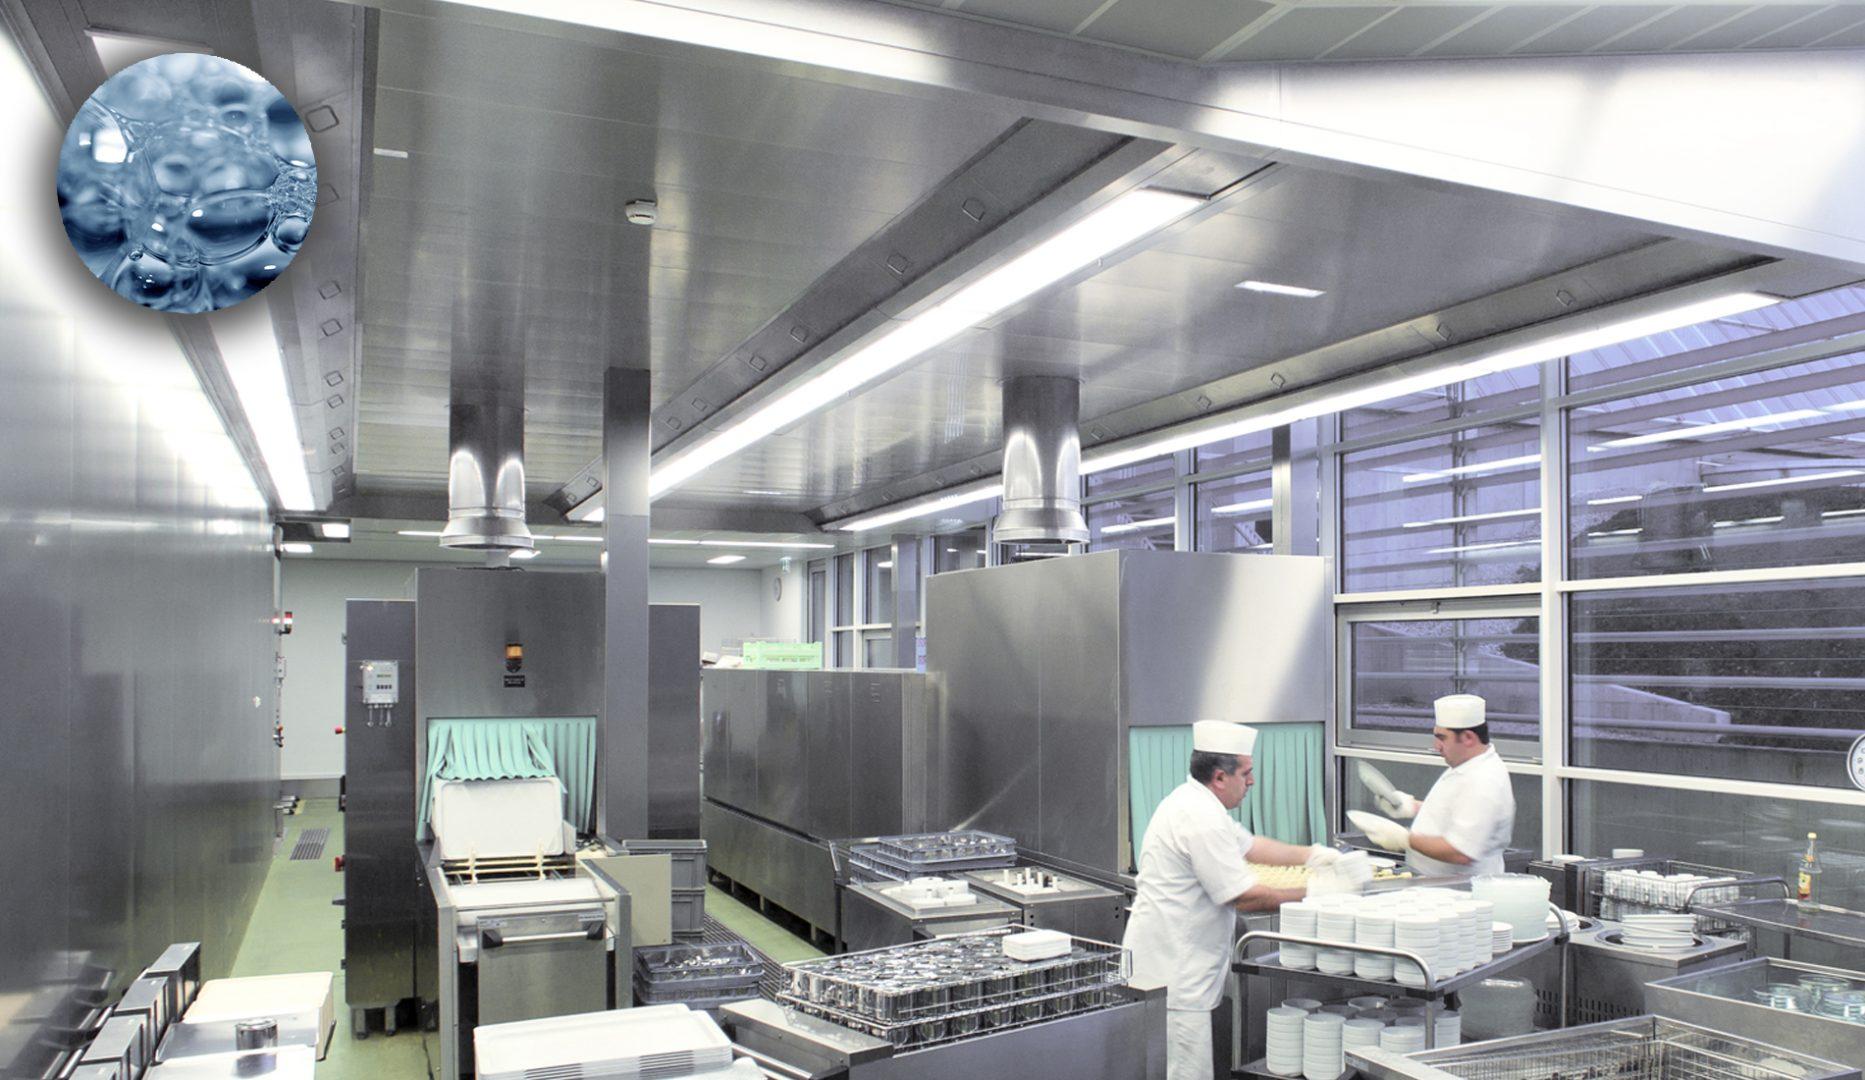 KCV-WW water wash ventilated ceiling for dishwashing areas